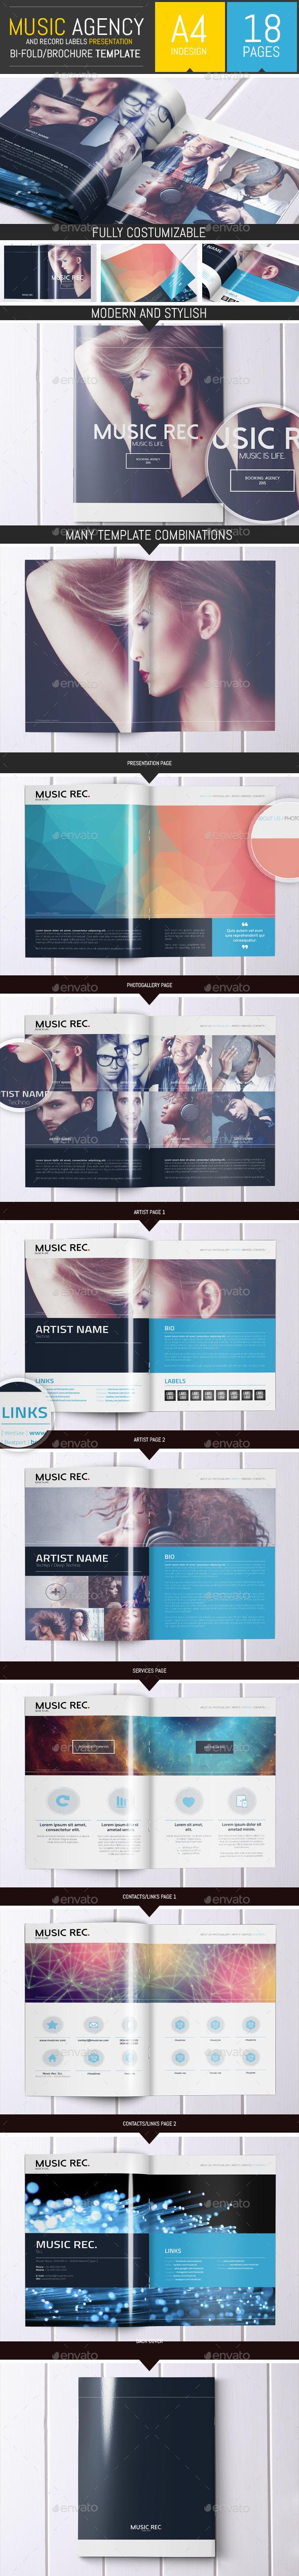 Music Agency Presentation Brochure / Bi-fold - Brochures Print Templates